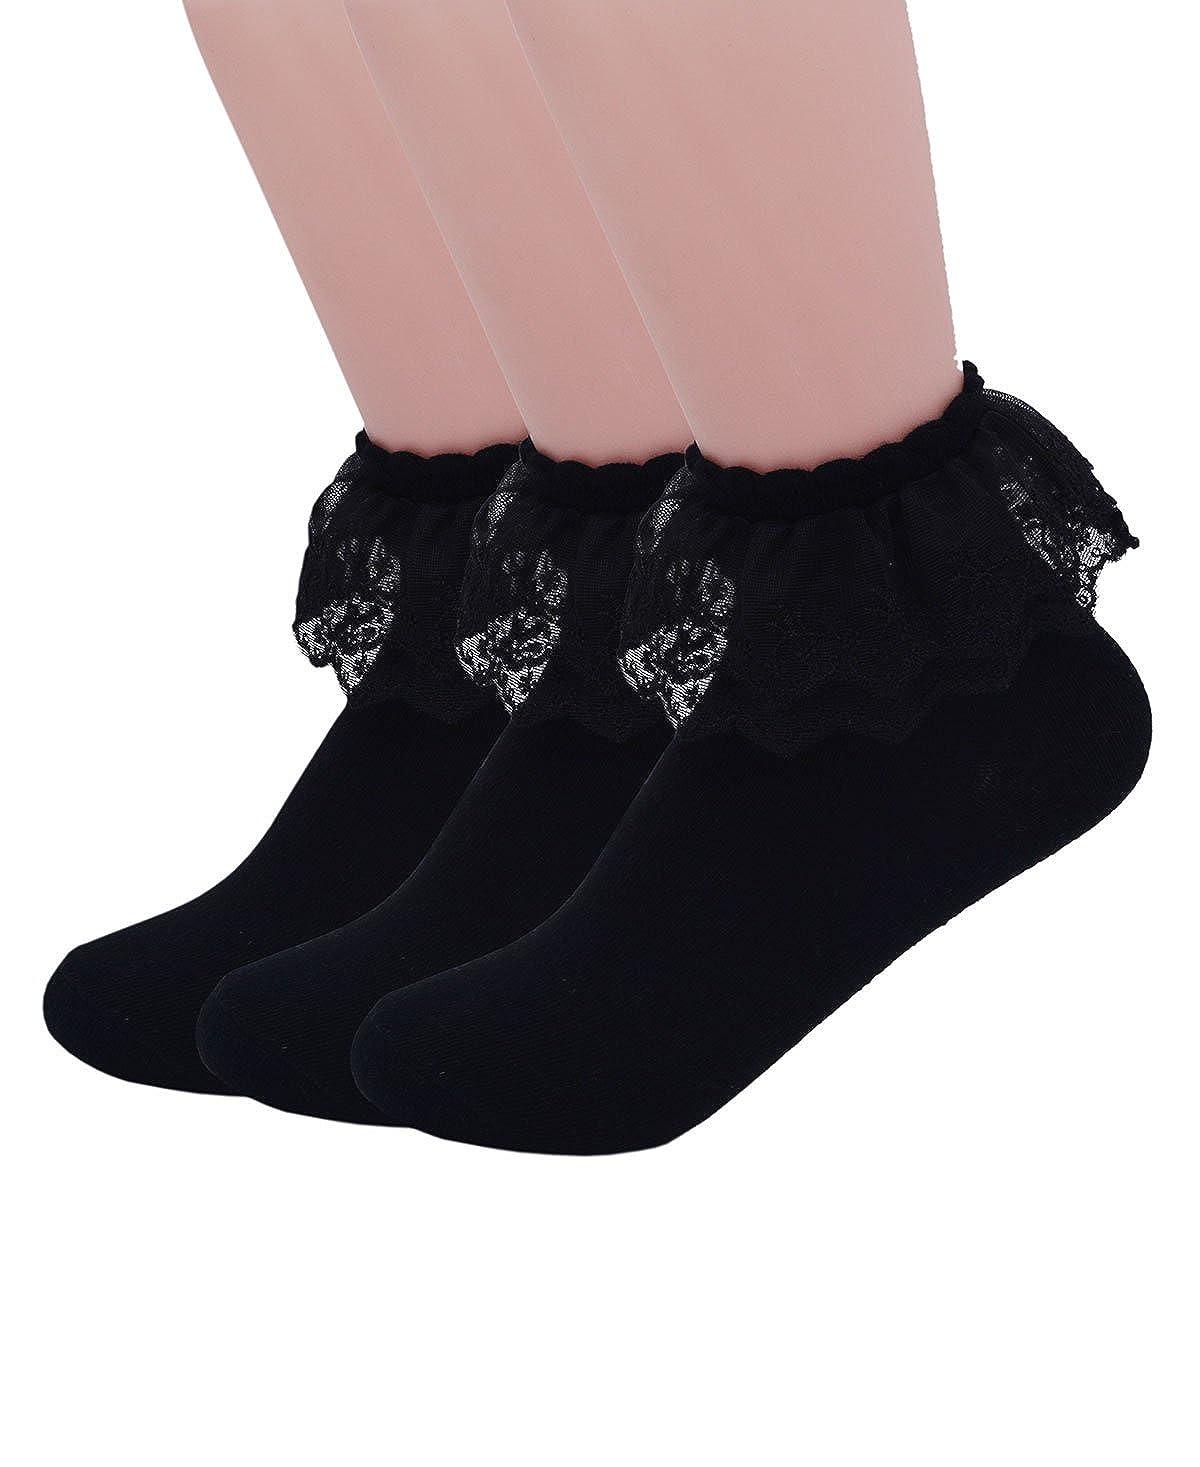 3 Pairs, Black YASIDI Women Socks, Comfortable NoShow Cotton Ankle lace Socks